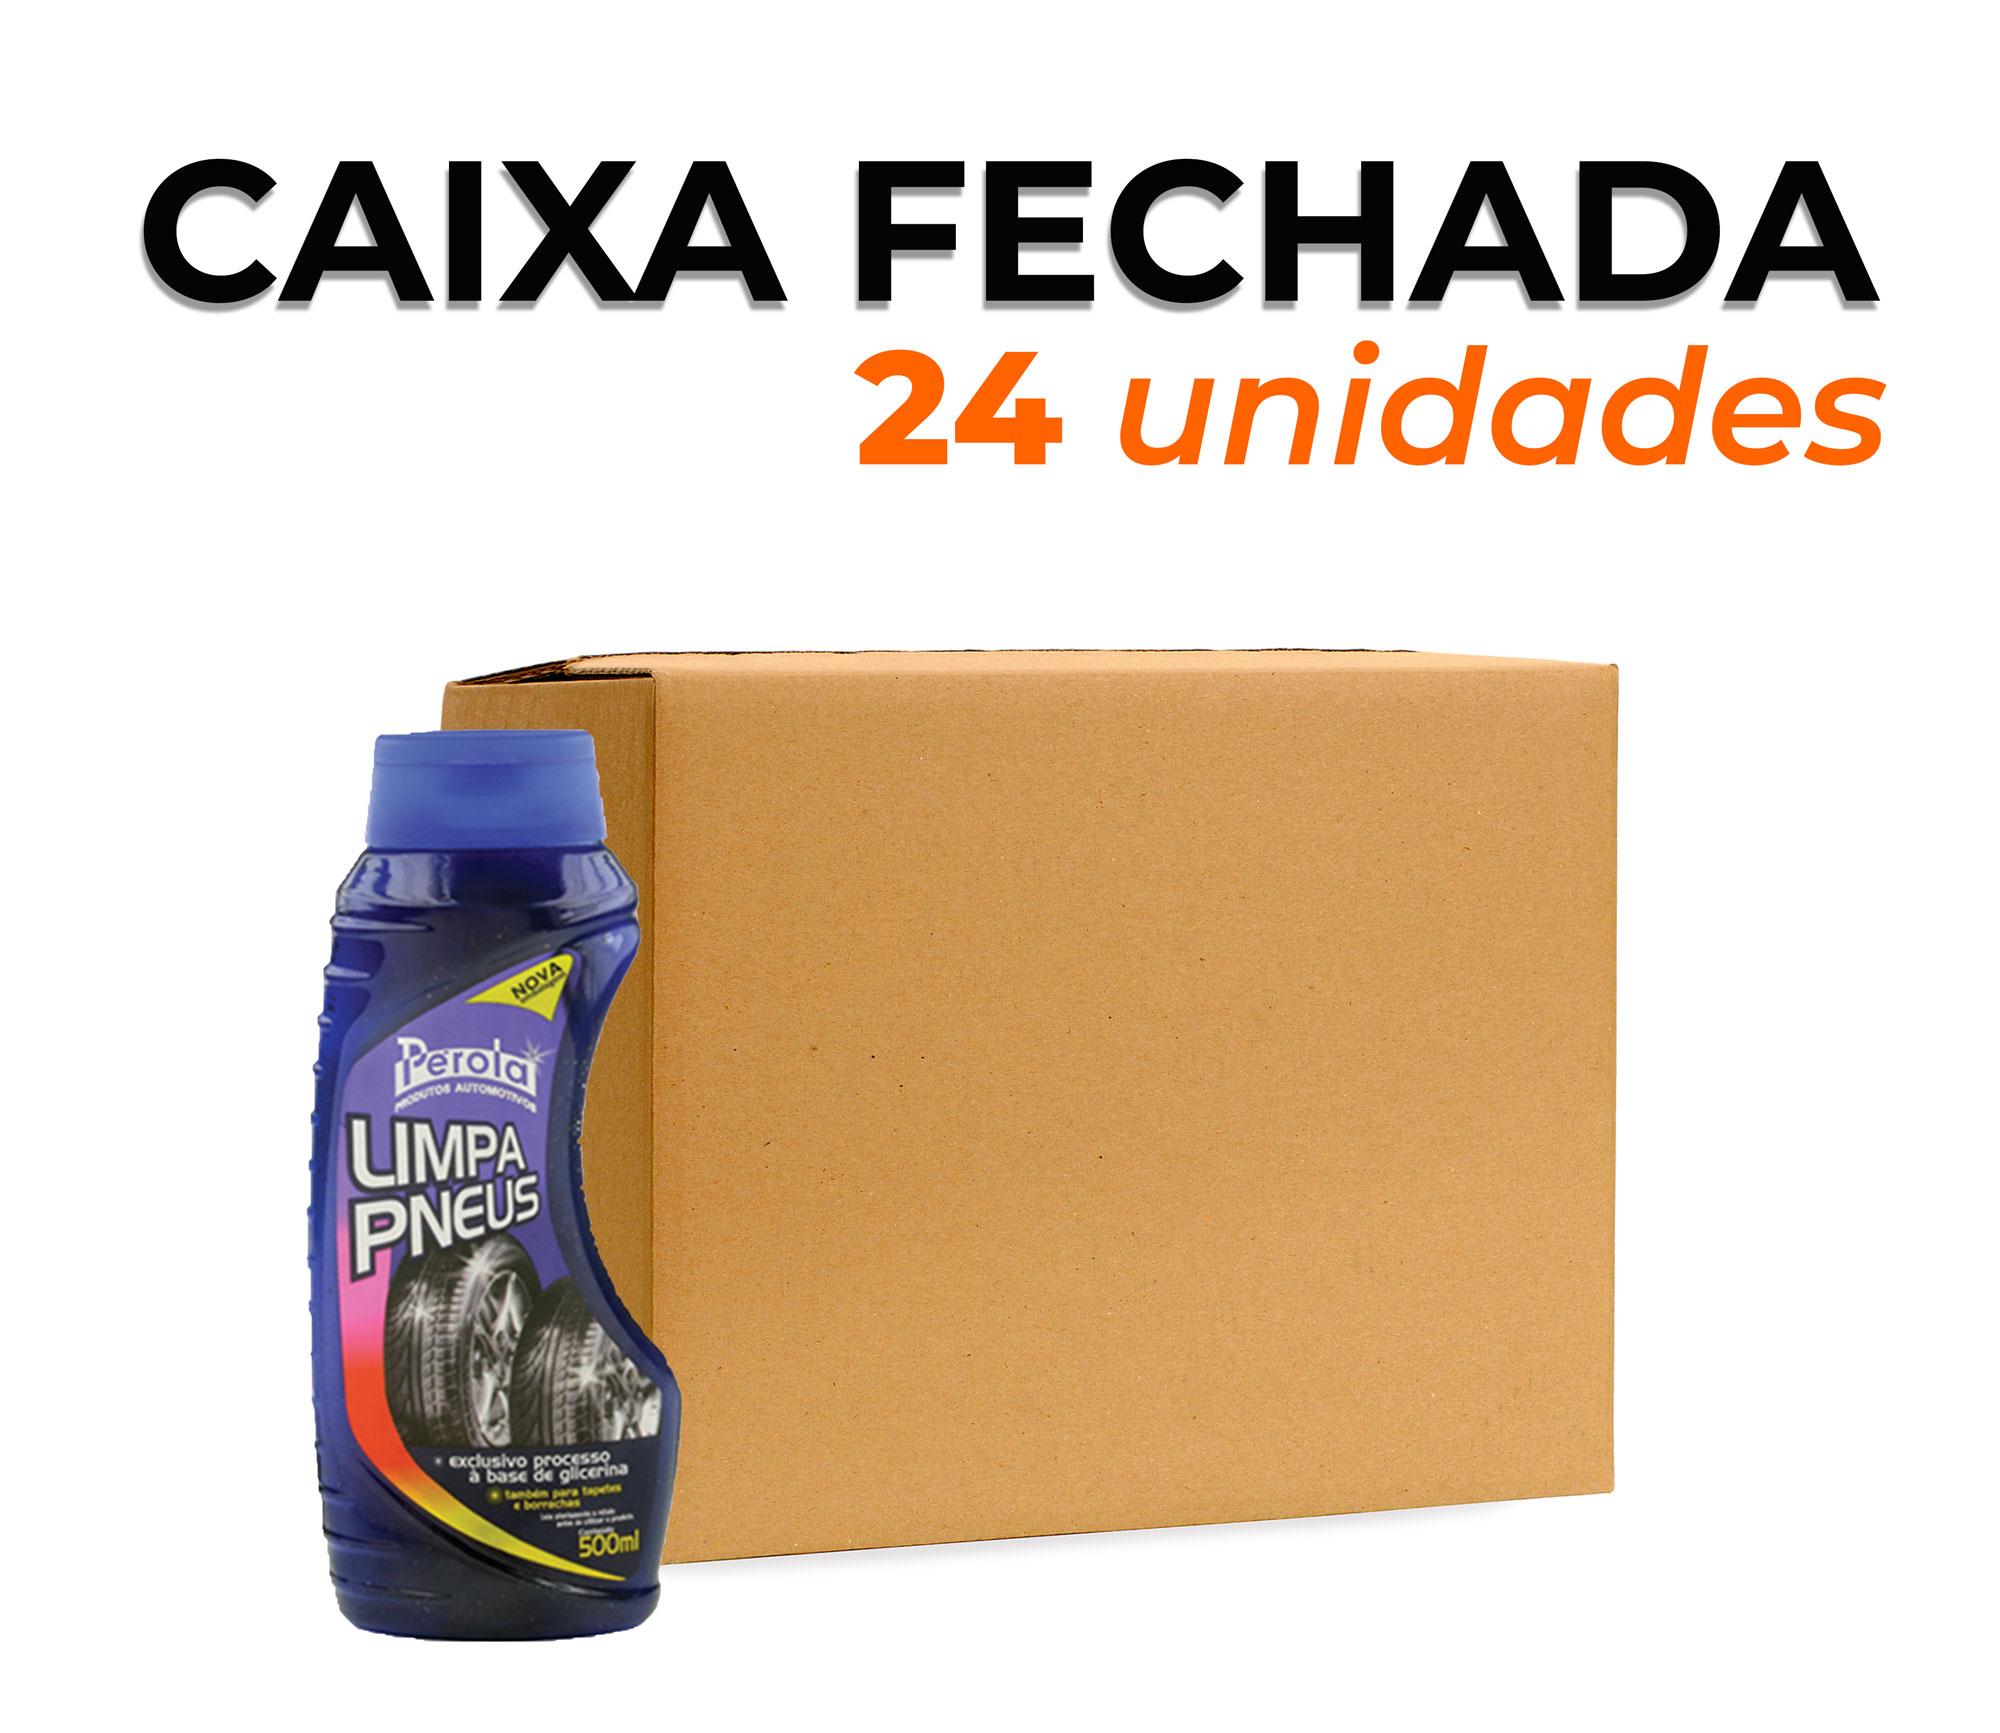 CAIXA LIMPA PNEUS PÉROLA | 500ml